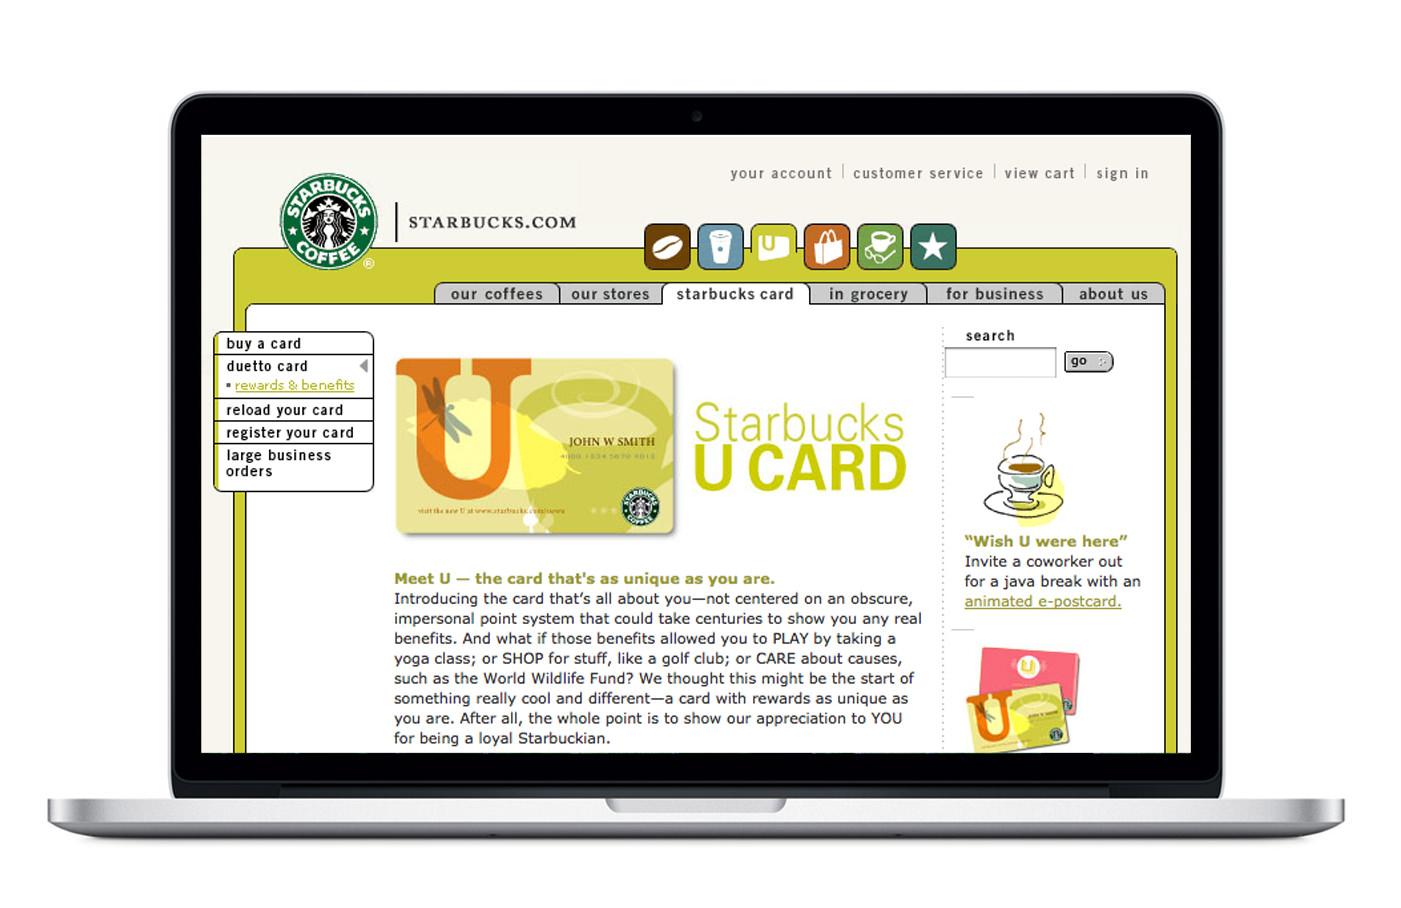 Angela_Dunkle_Creative_Director__STARBUCKS_REWARD_CARD_PROGRAM_U_CARD.jpg